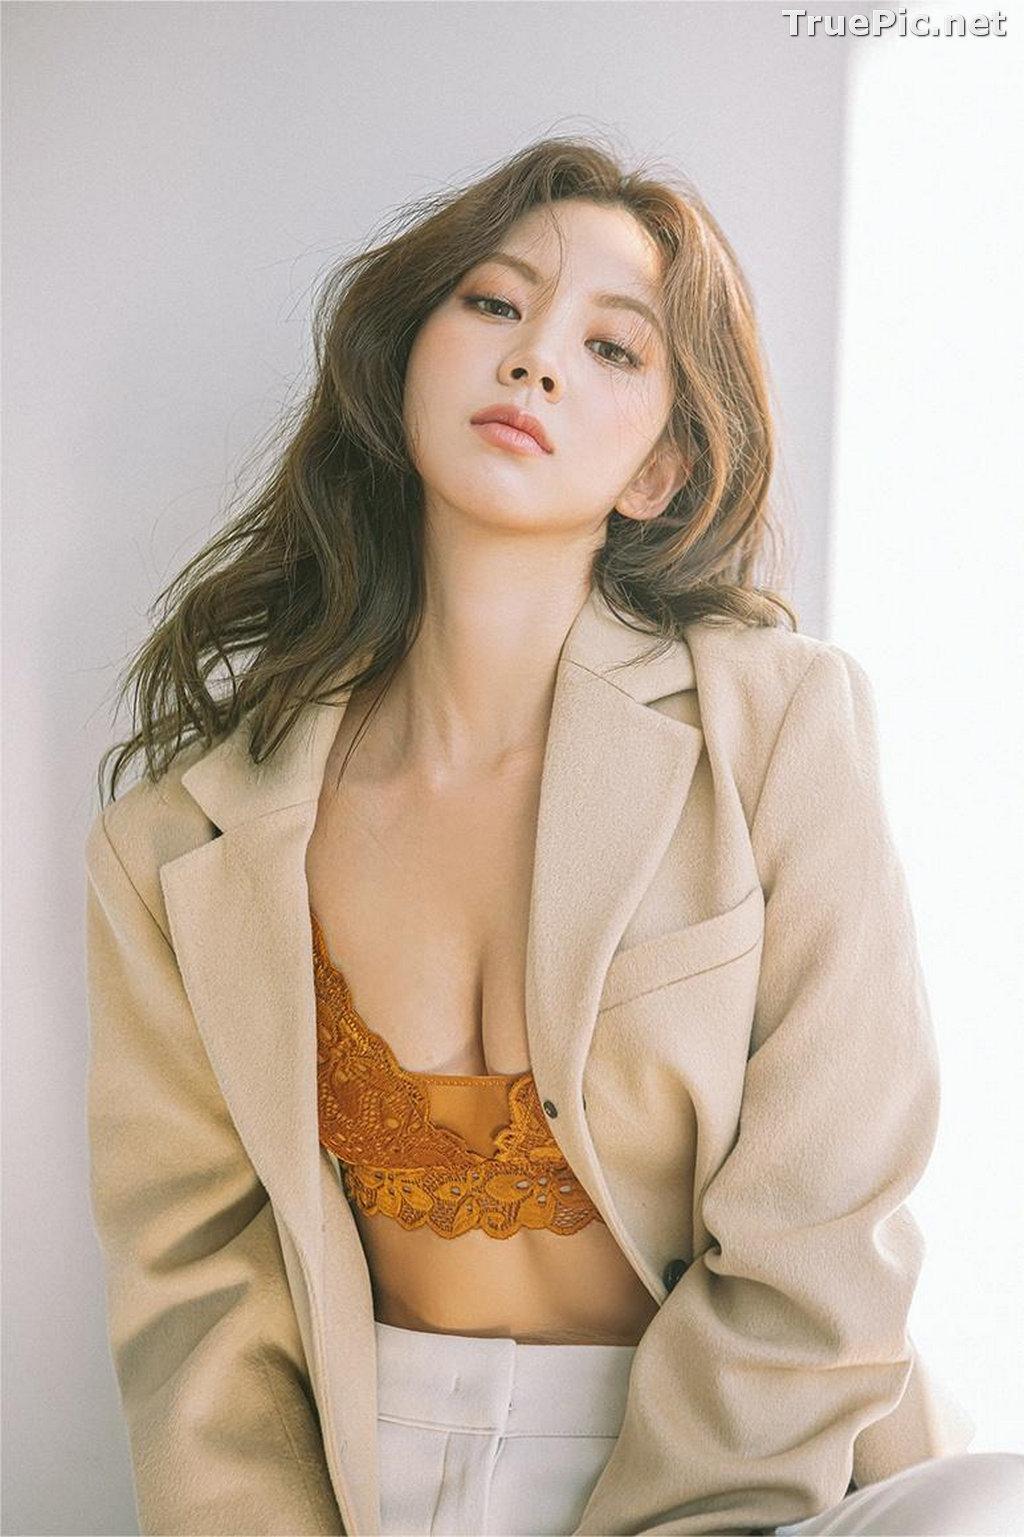 Image Korean Fashion Model – Lee Chae Eun (이채은) – Come On Vincent Lingerie #10 - TruePic.net - Picture-2